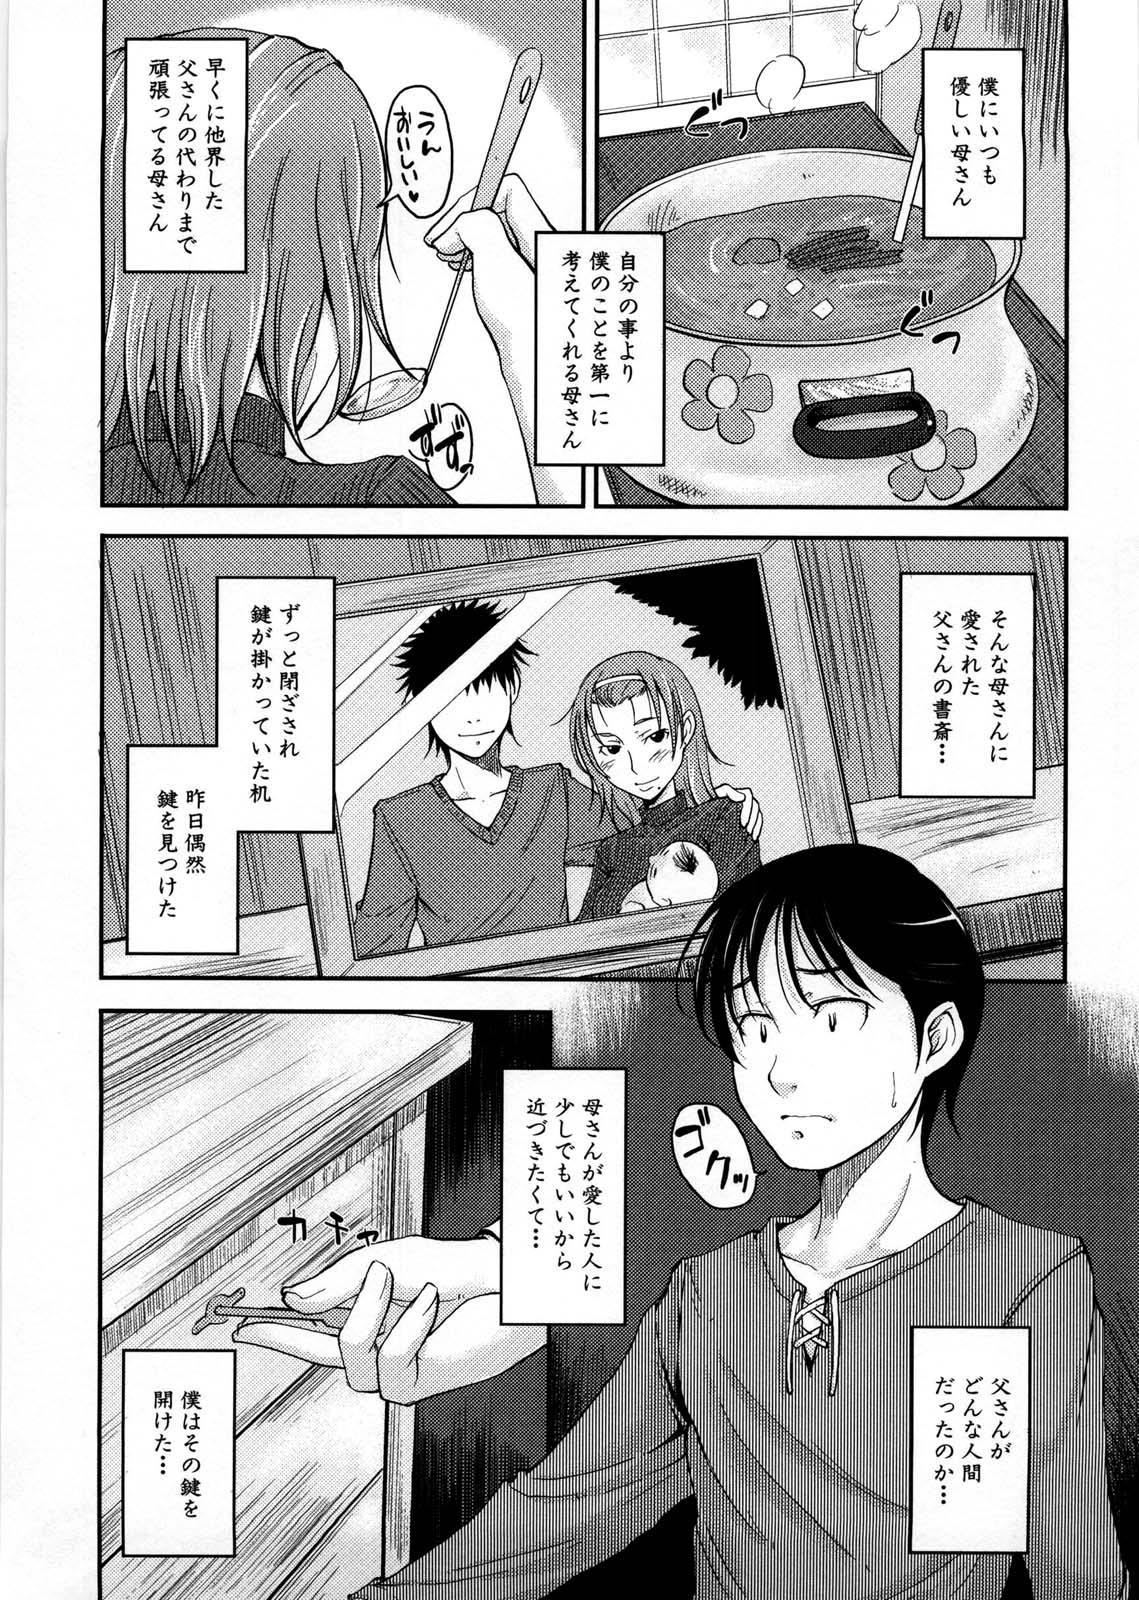 Imouto Ijou Hahaoya Miman 131